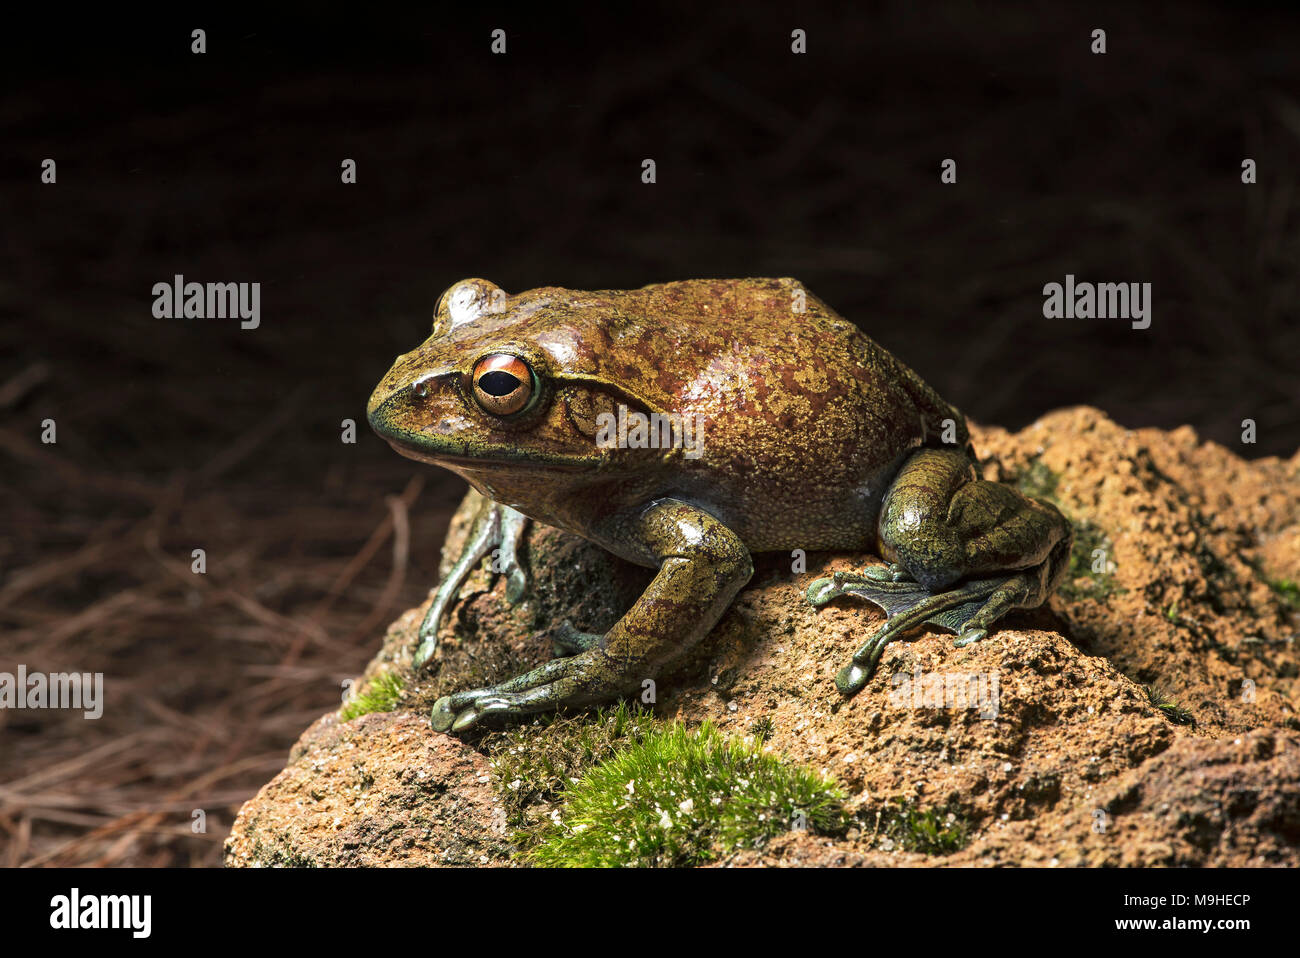 Endemic frog species Boophis goudoti, Mantellidae family, Anjozorobe National Park, Madagascar - Stock Image